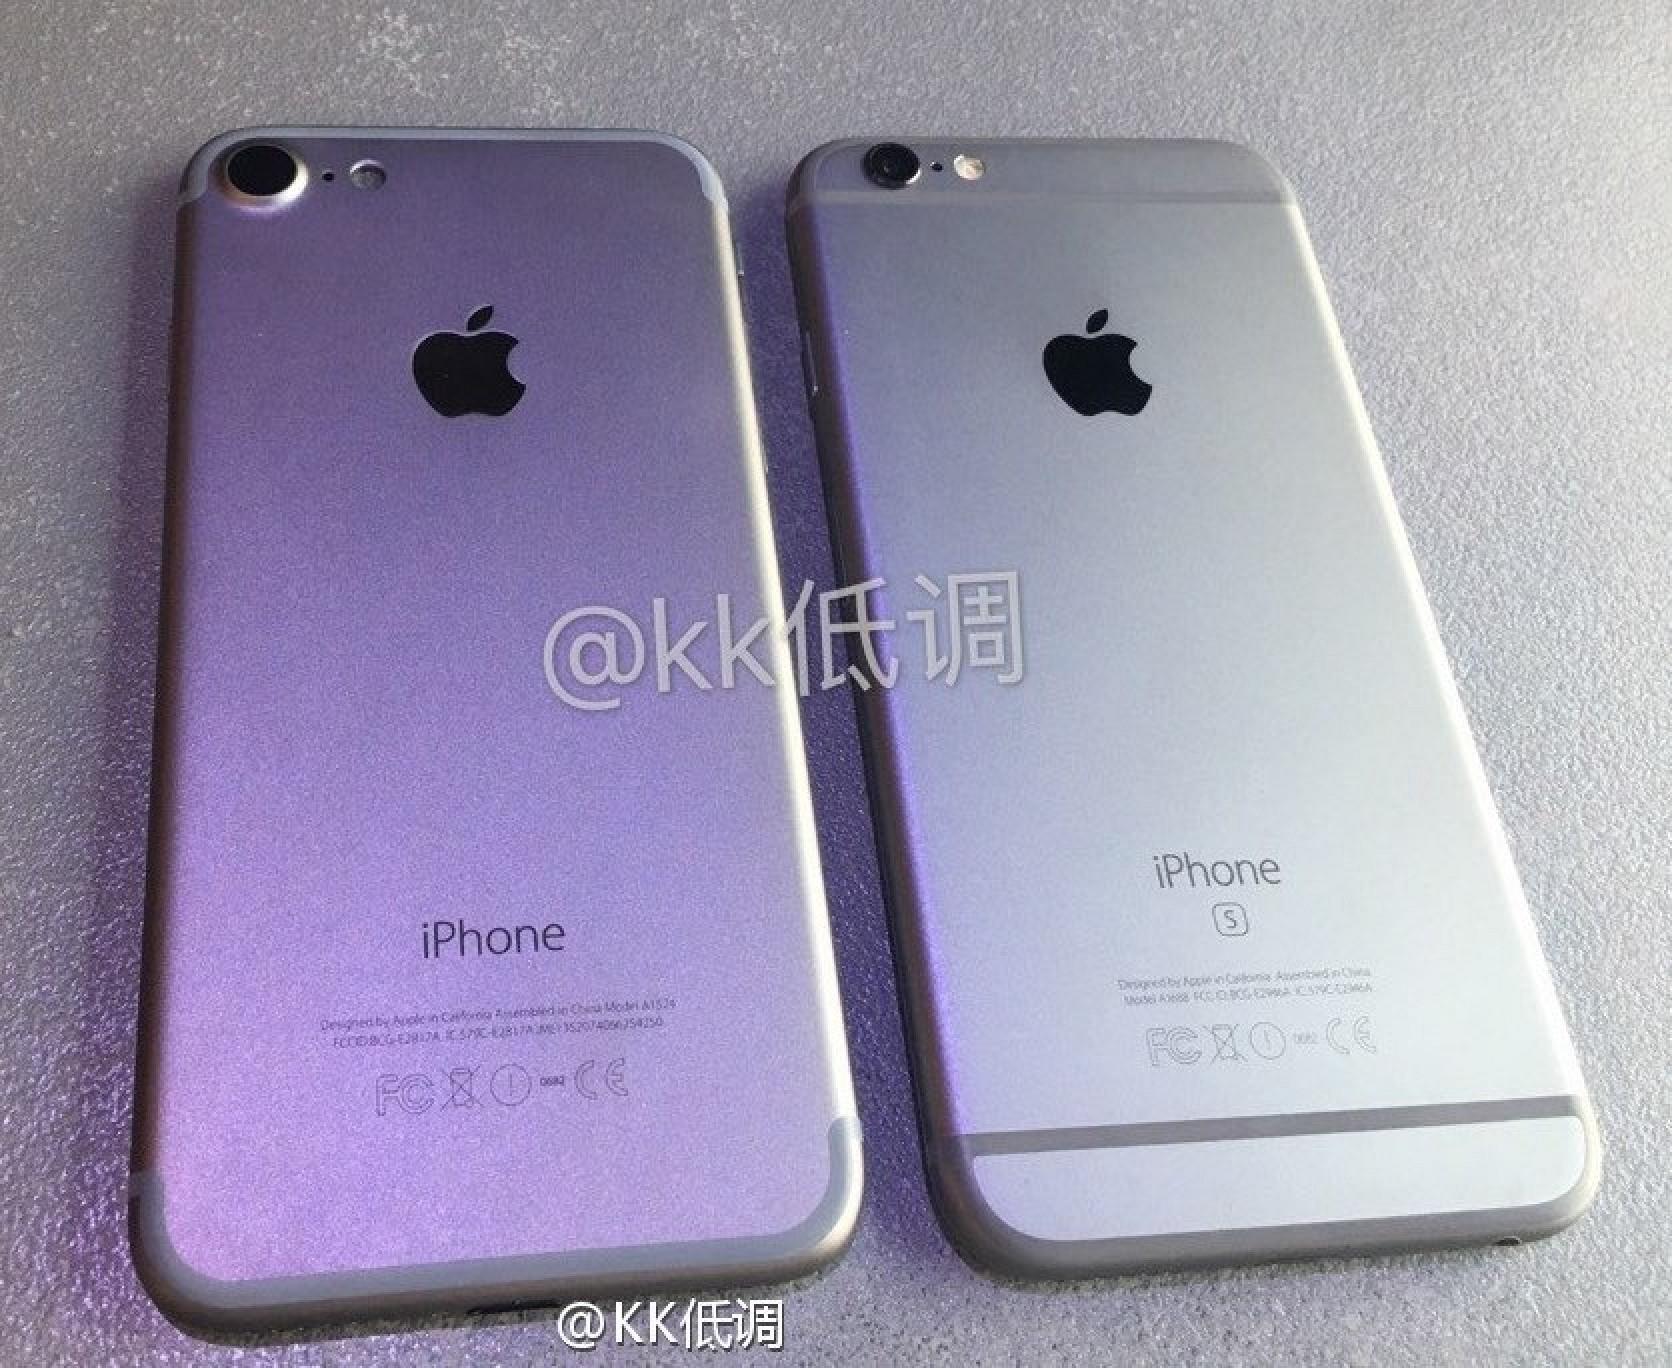 New iphone 6 video